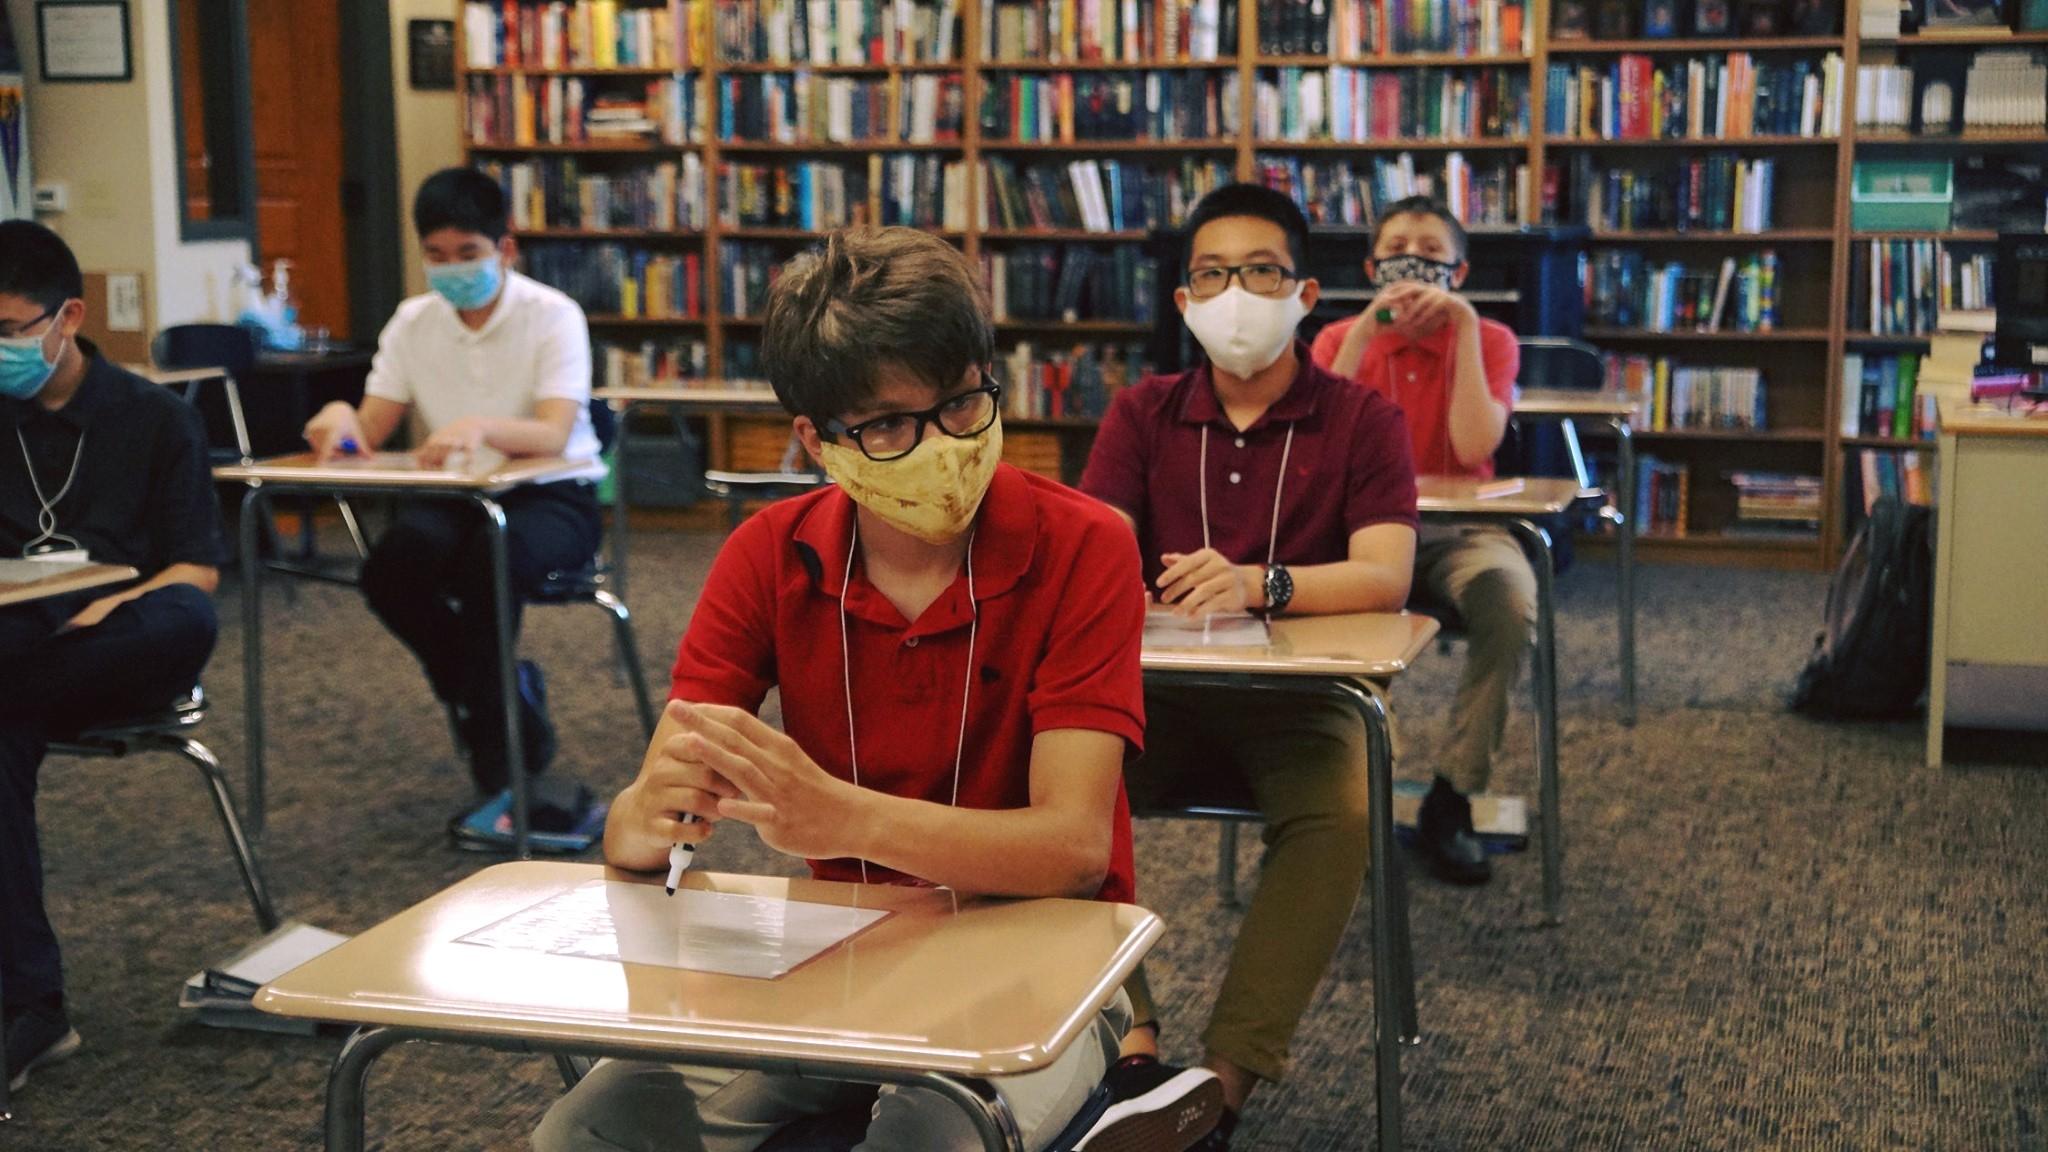 boys in a classroom3